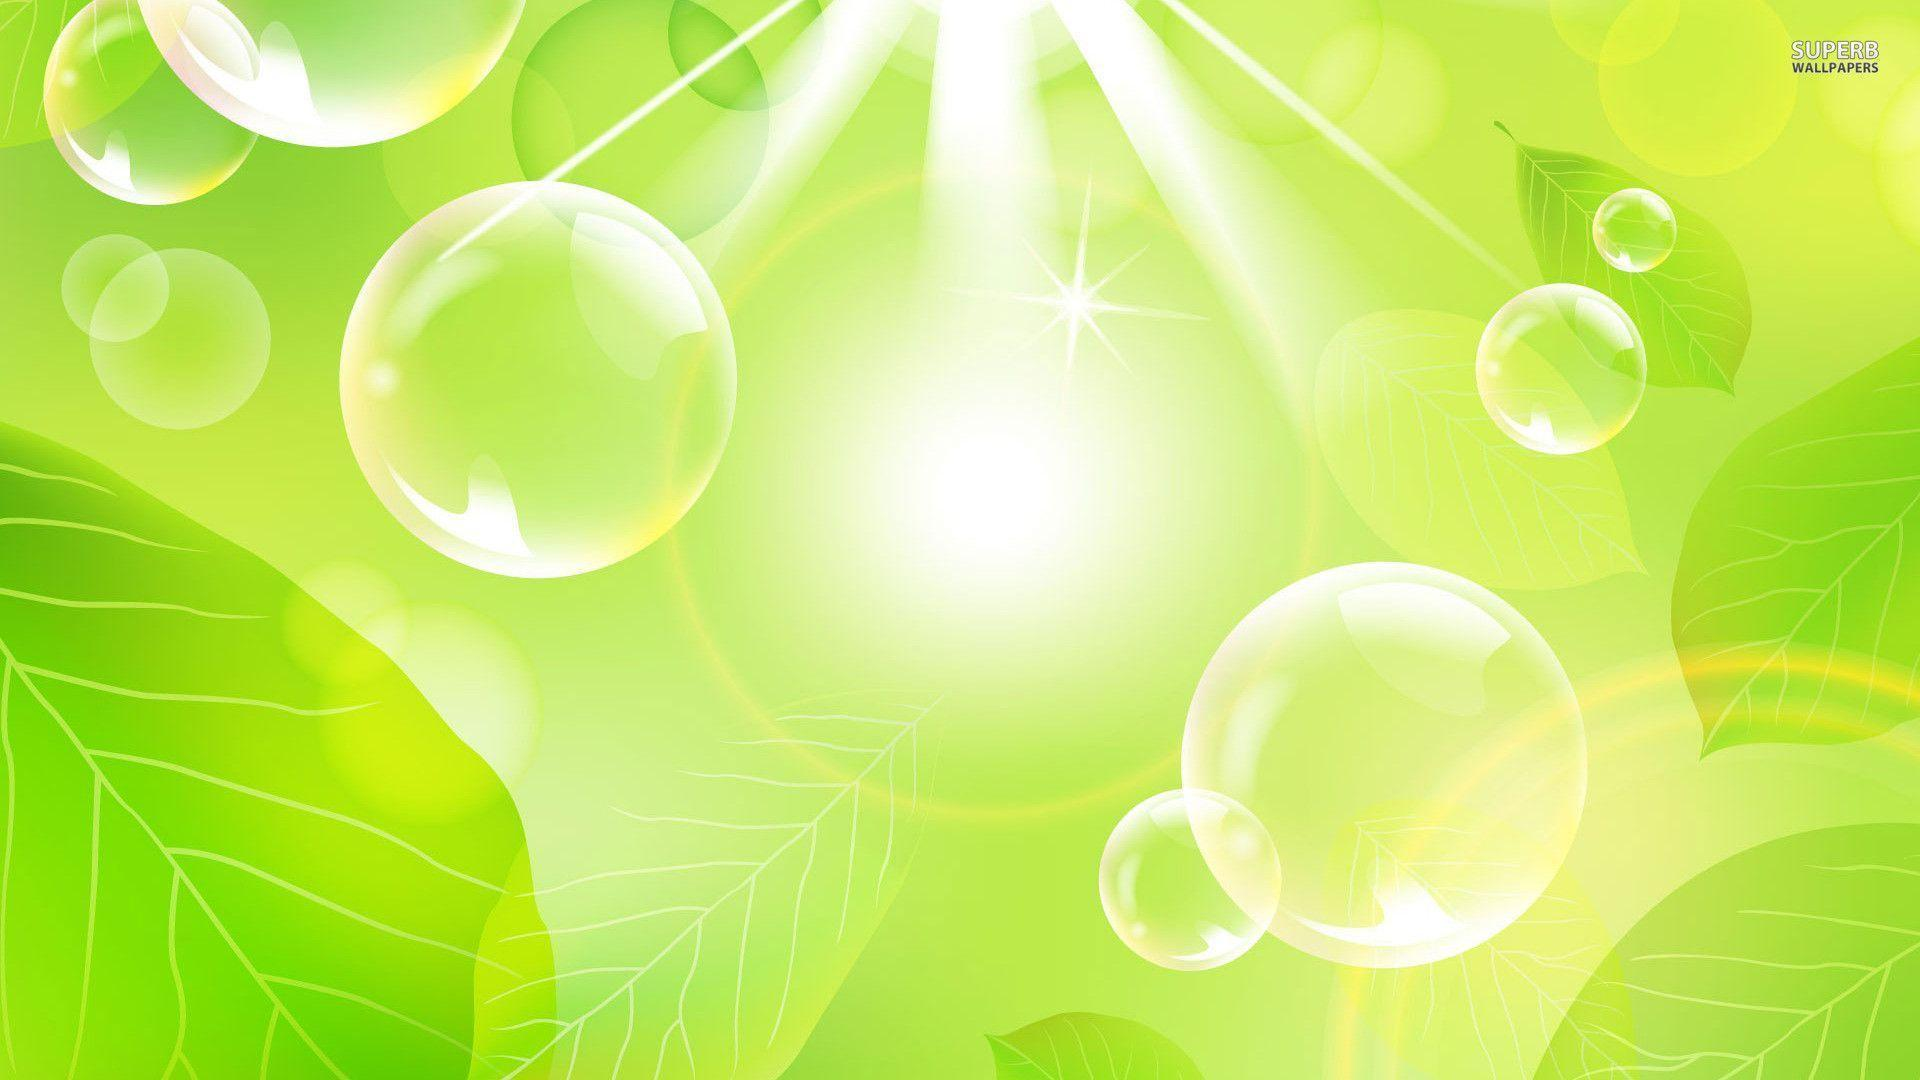 green leaf wallpaper image - photo #37